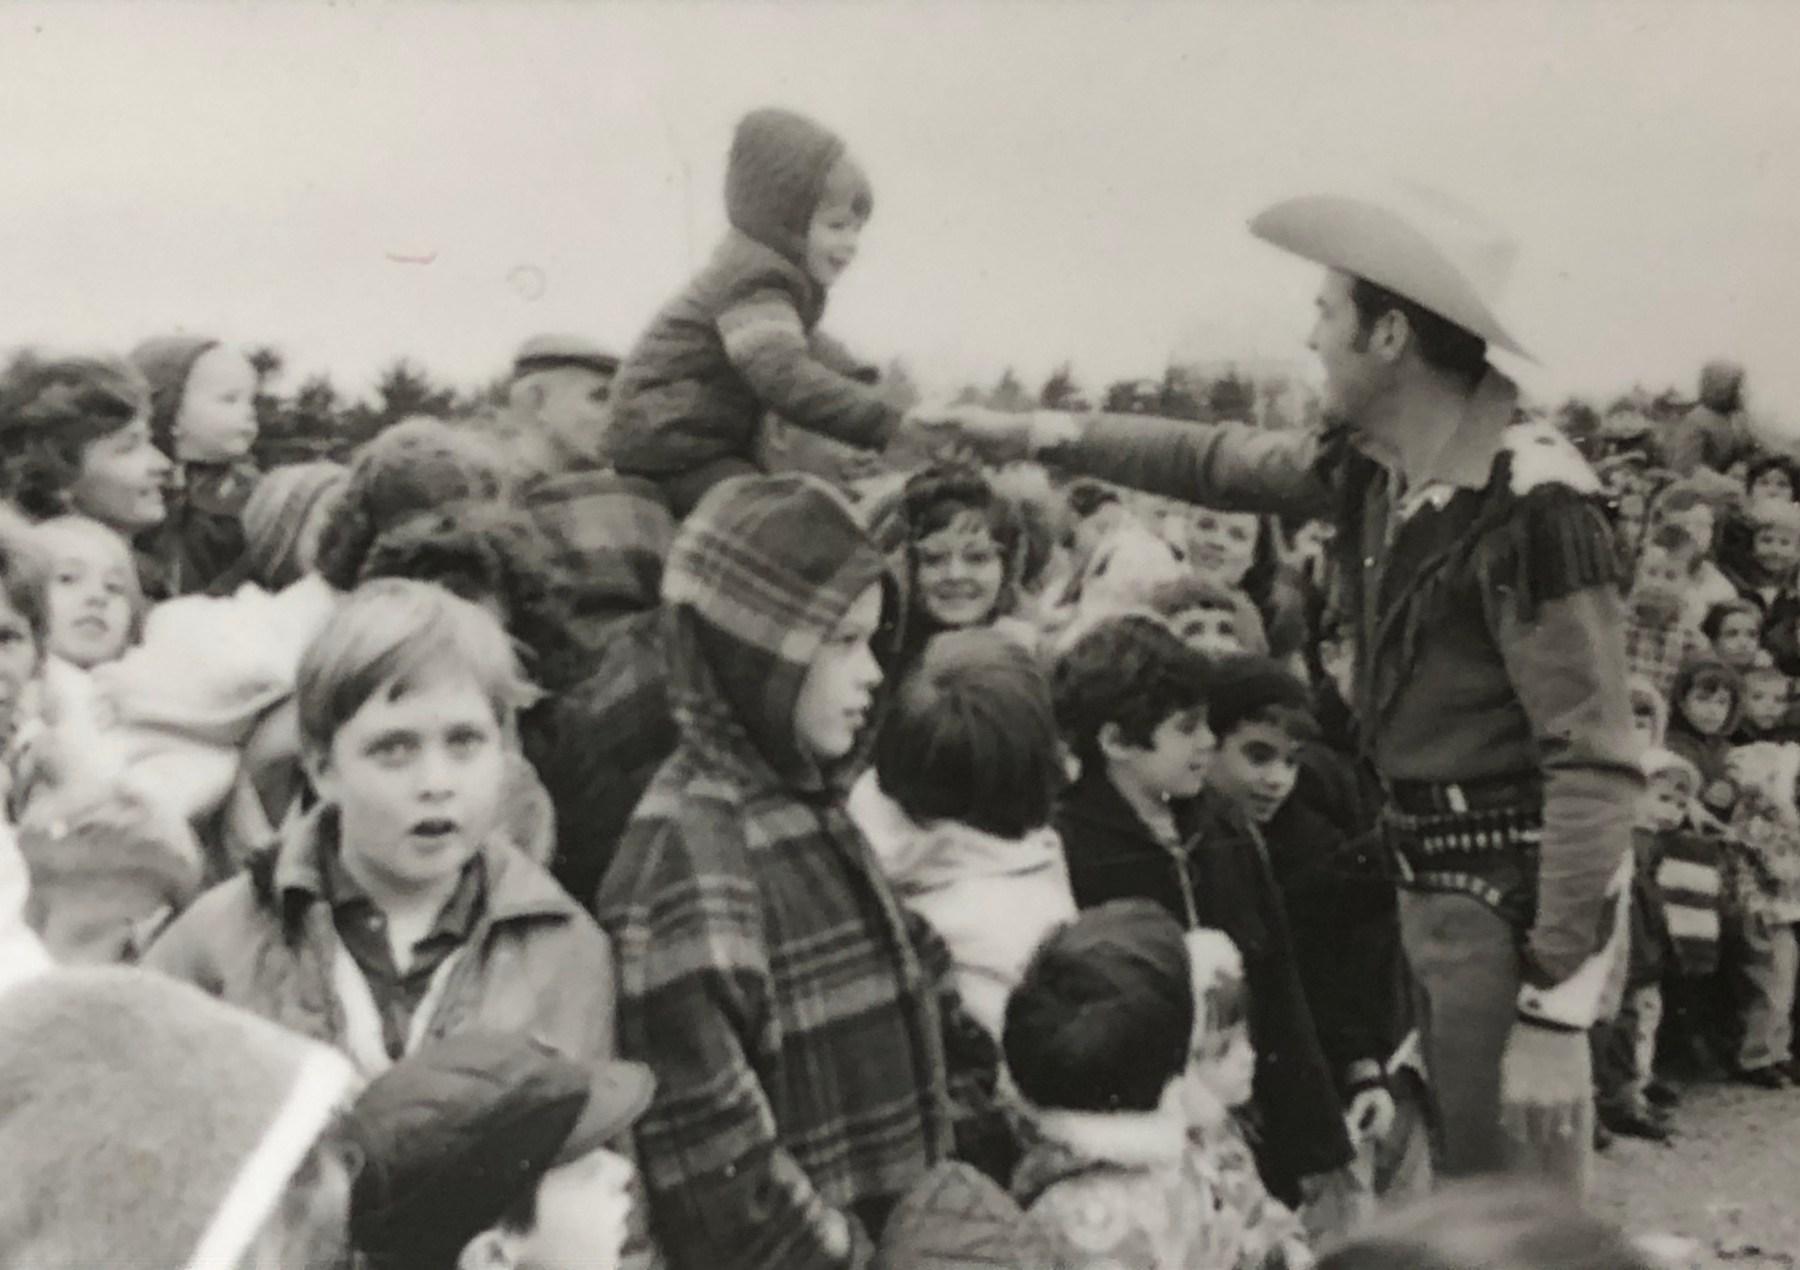 Rex Trailer shakes child's hand